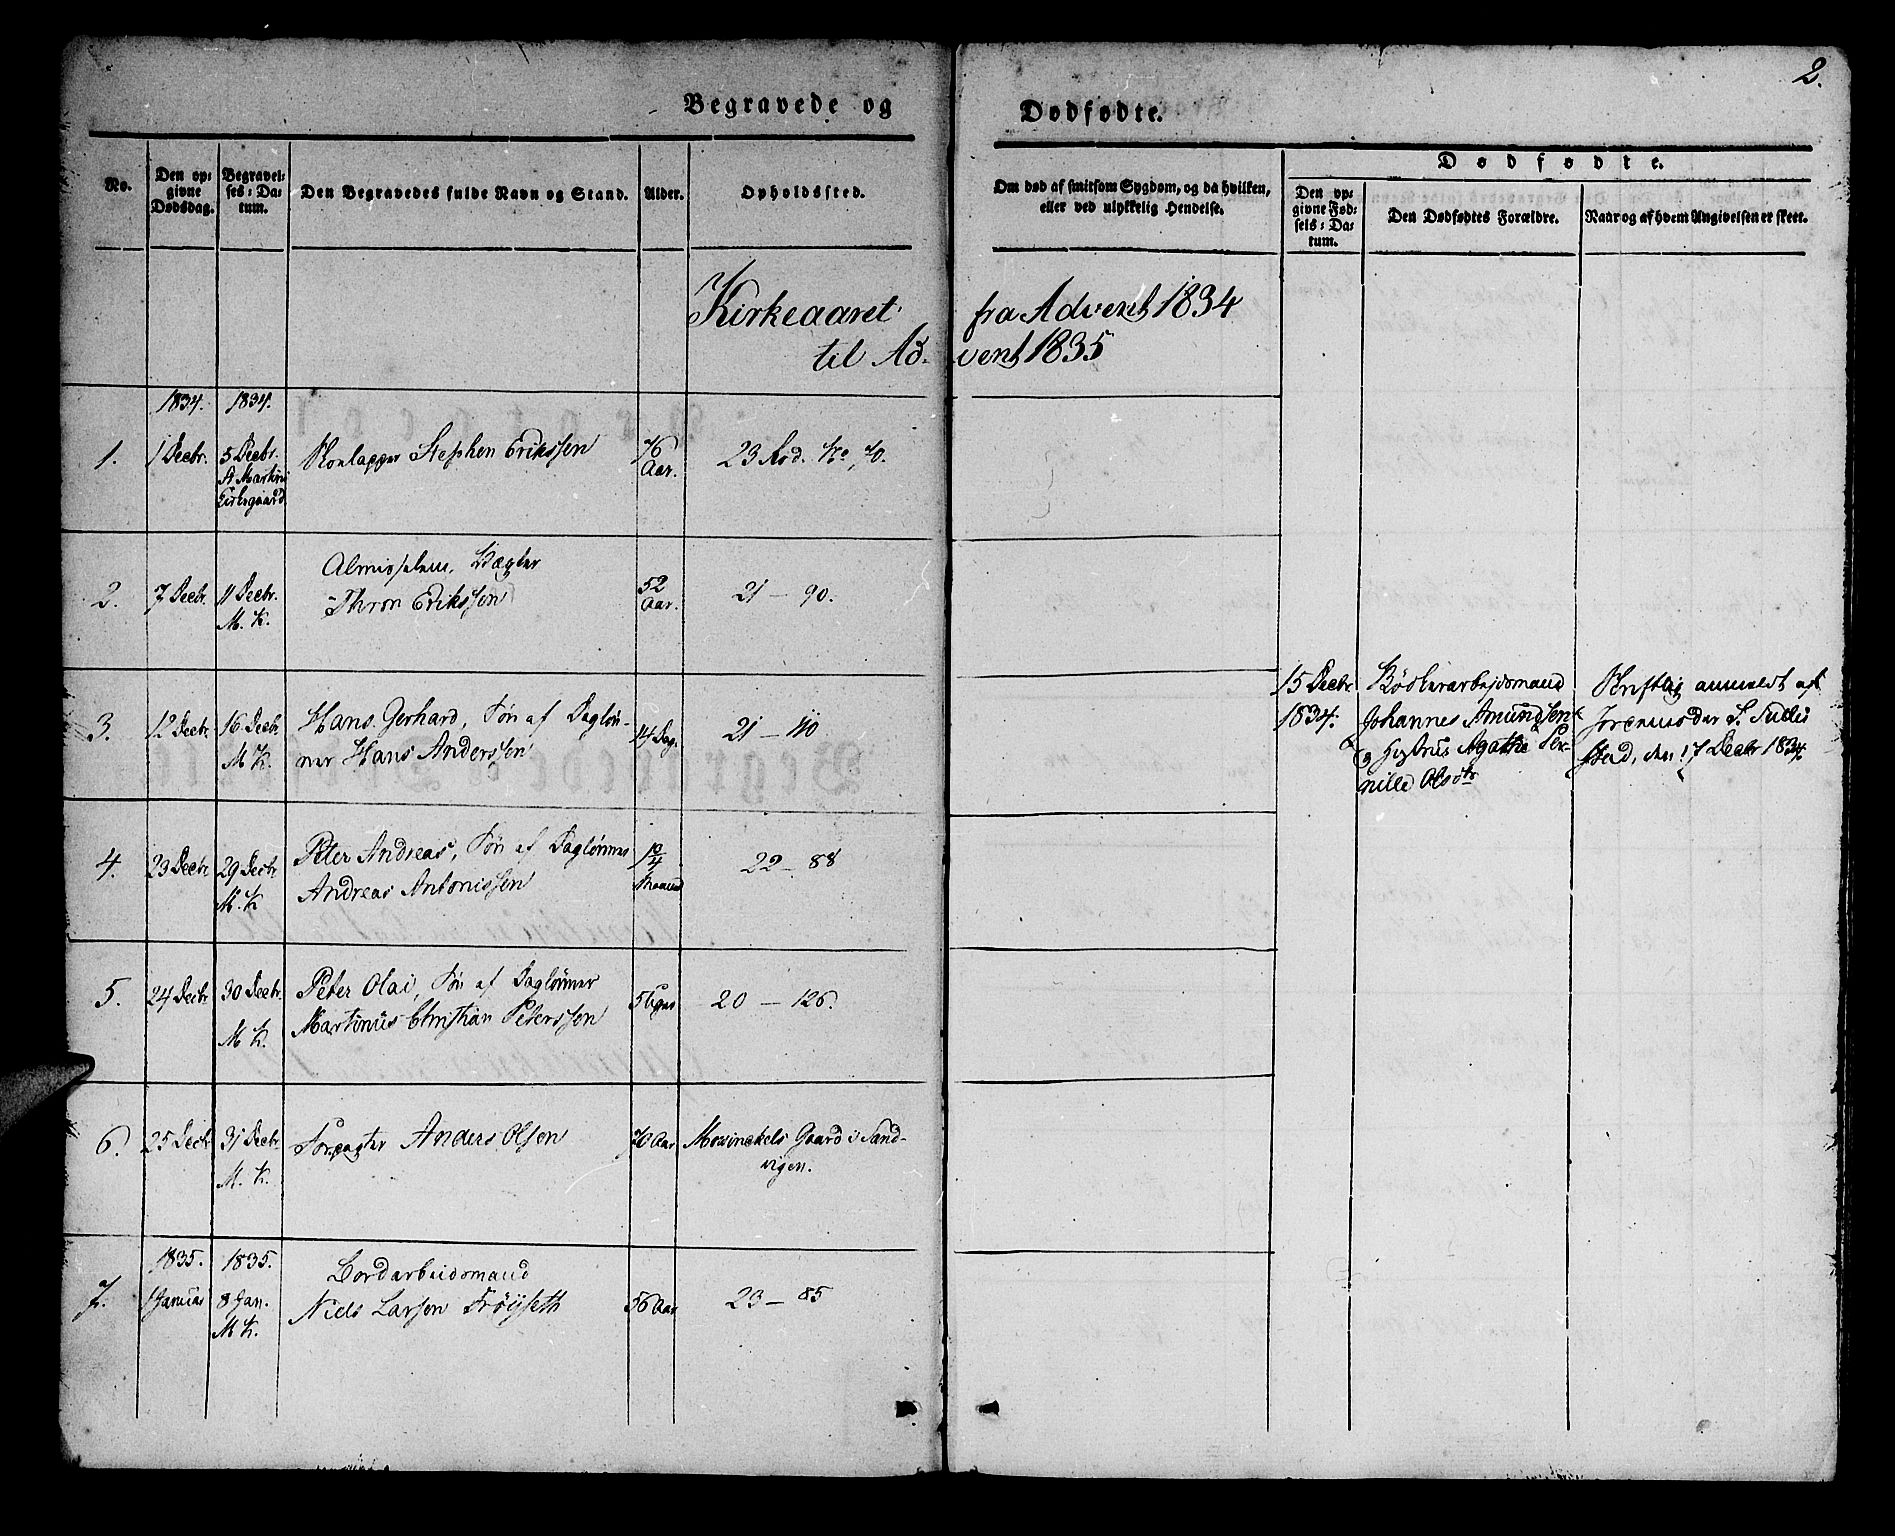 SAB, Korskirken Sokneprestembete, H/Haa/L0043: Ministerialbok nr. E 1, 1834-1848, s. 2